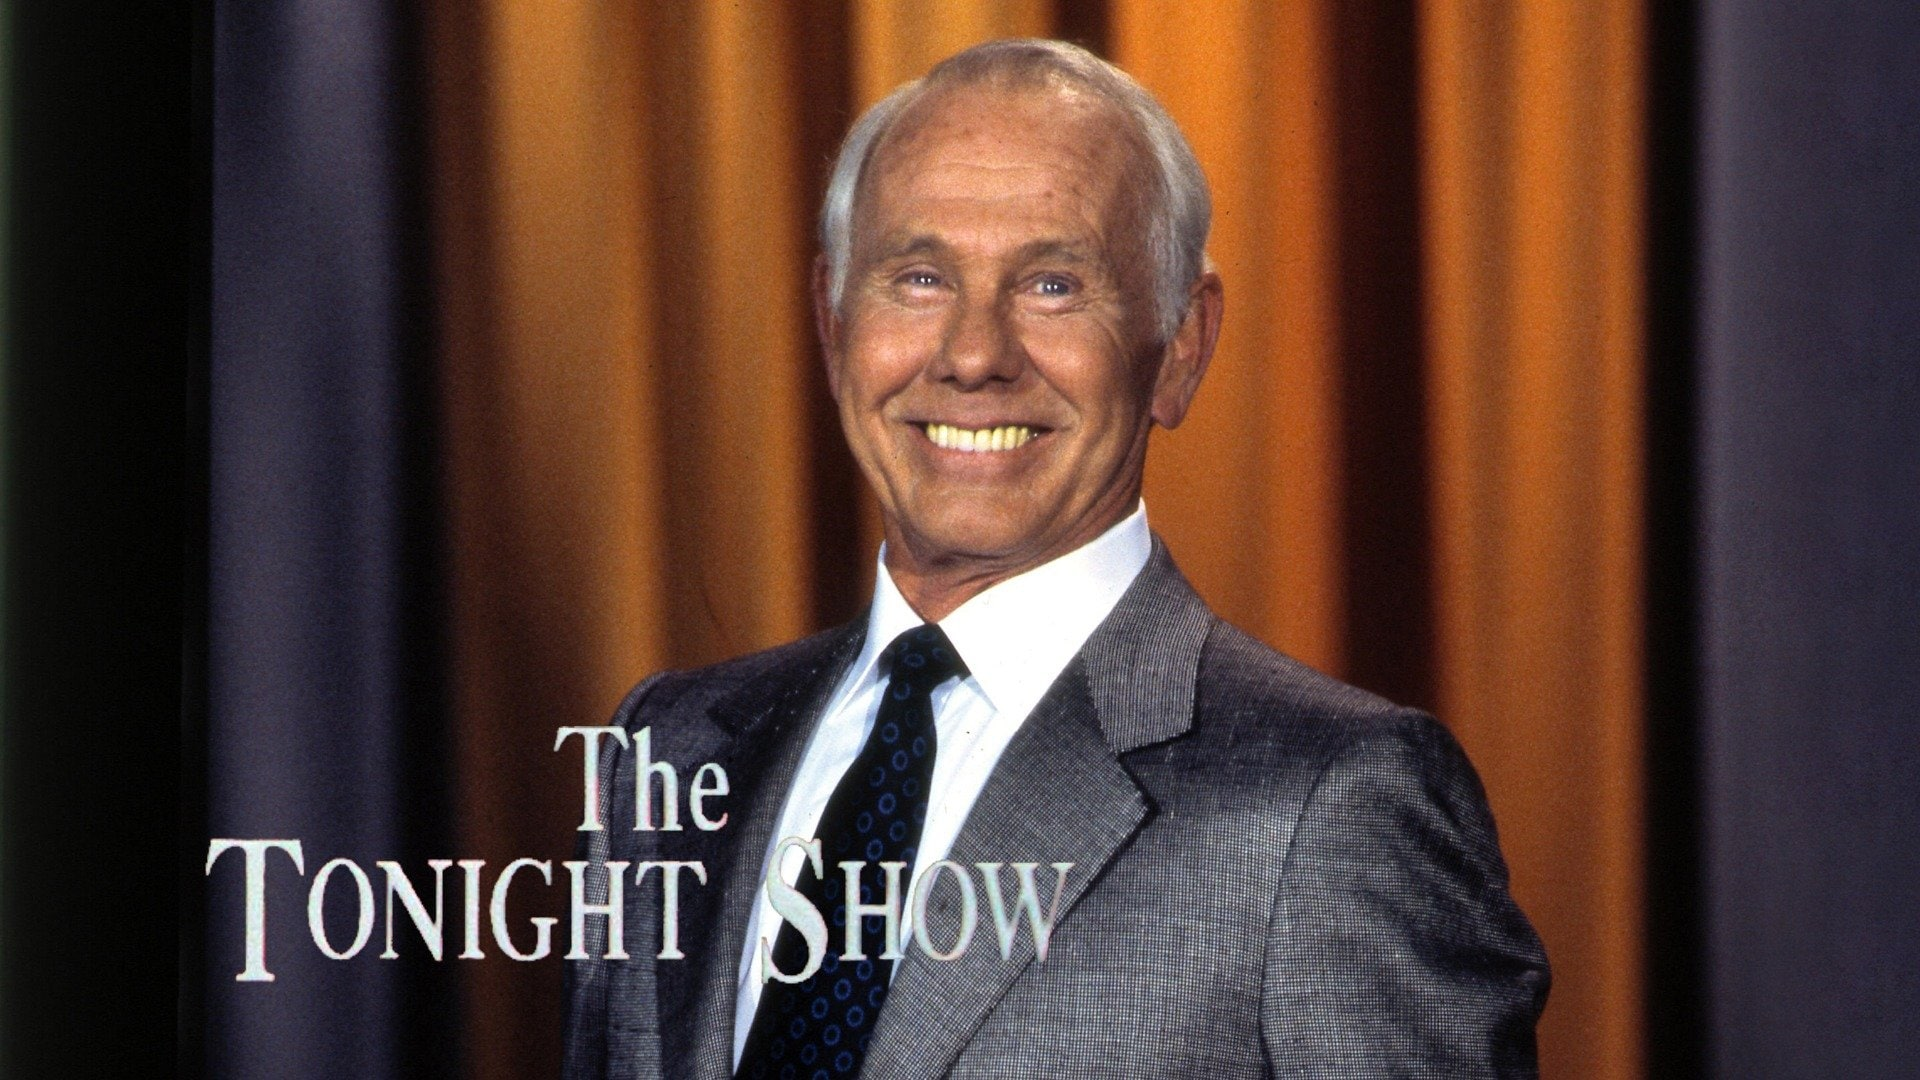 The Johnny Carson Show: Comic Legends Of The '80s - Ellen DeGeneres (5/21/87)